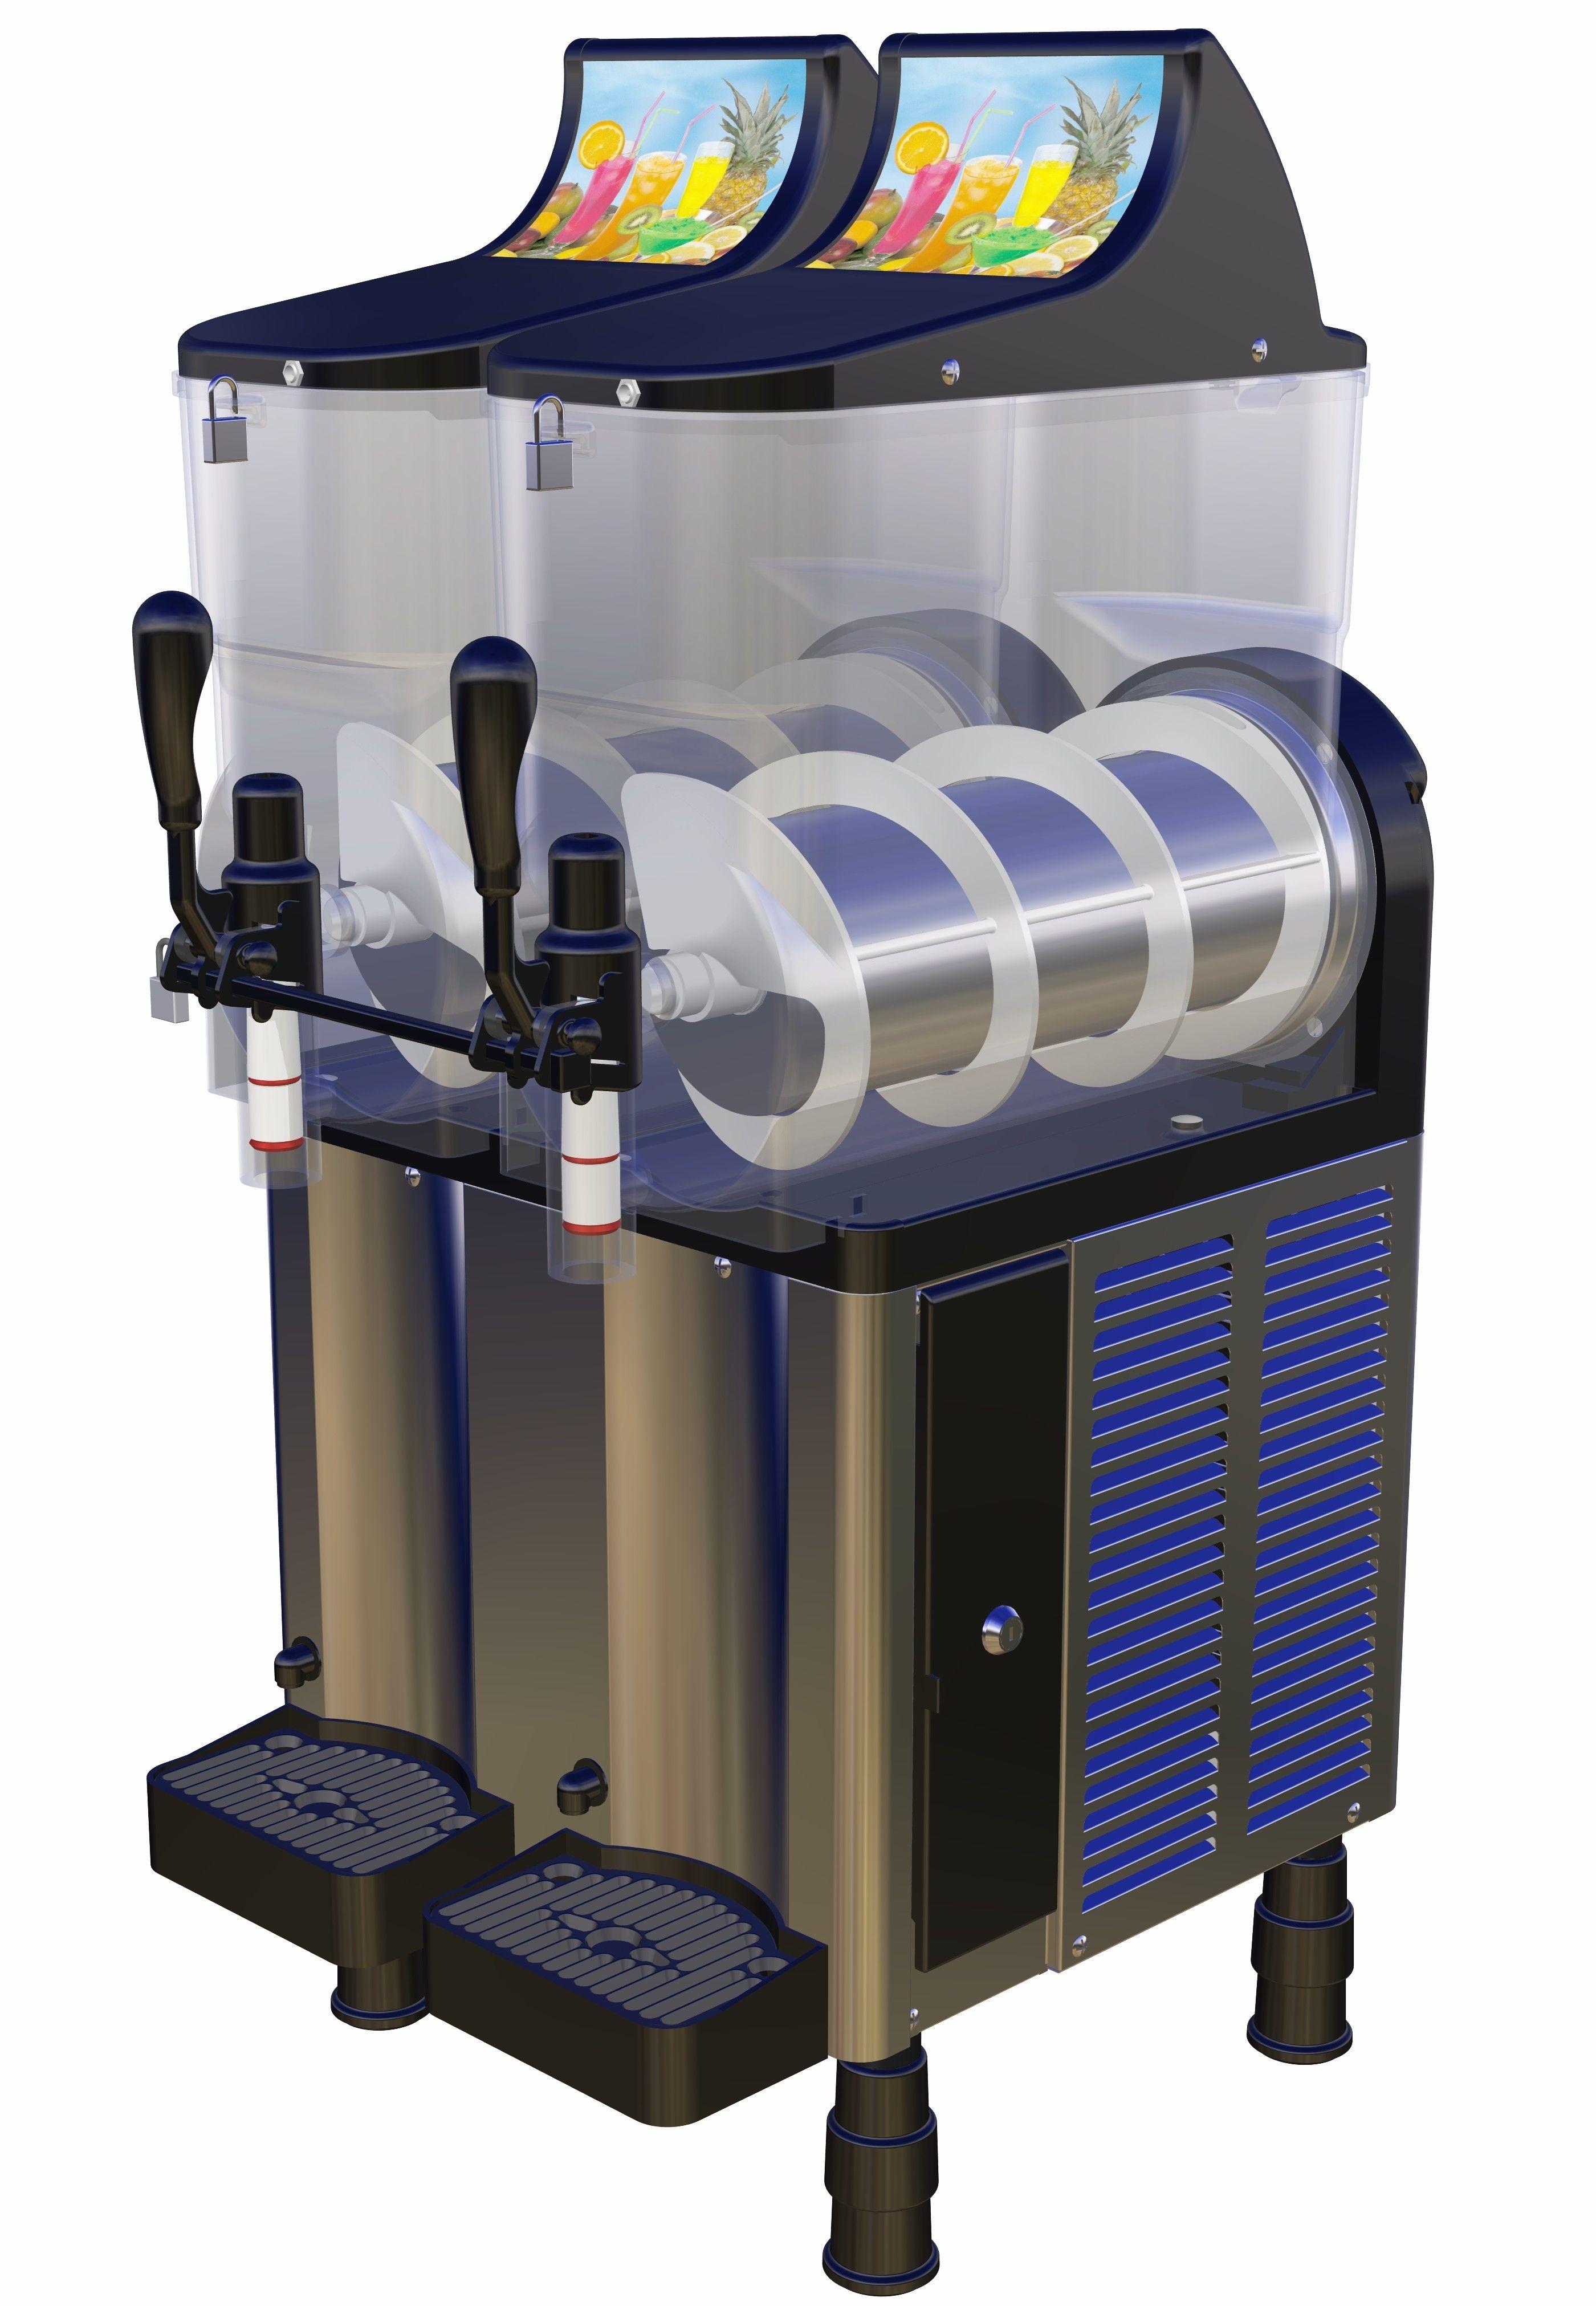 margarita slushy machines - Slushie Machines